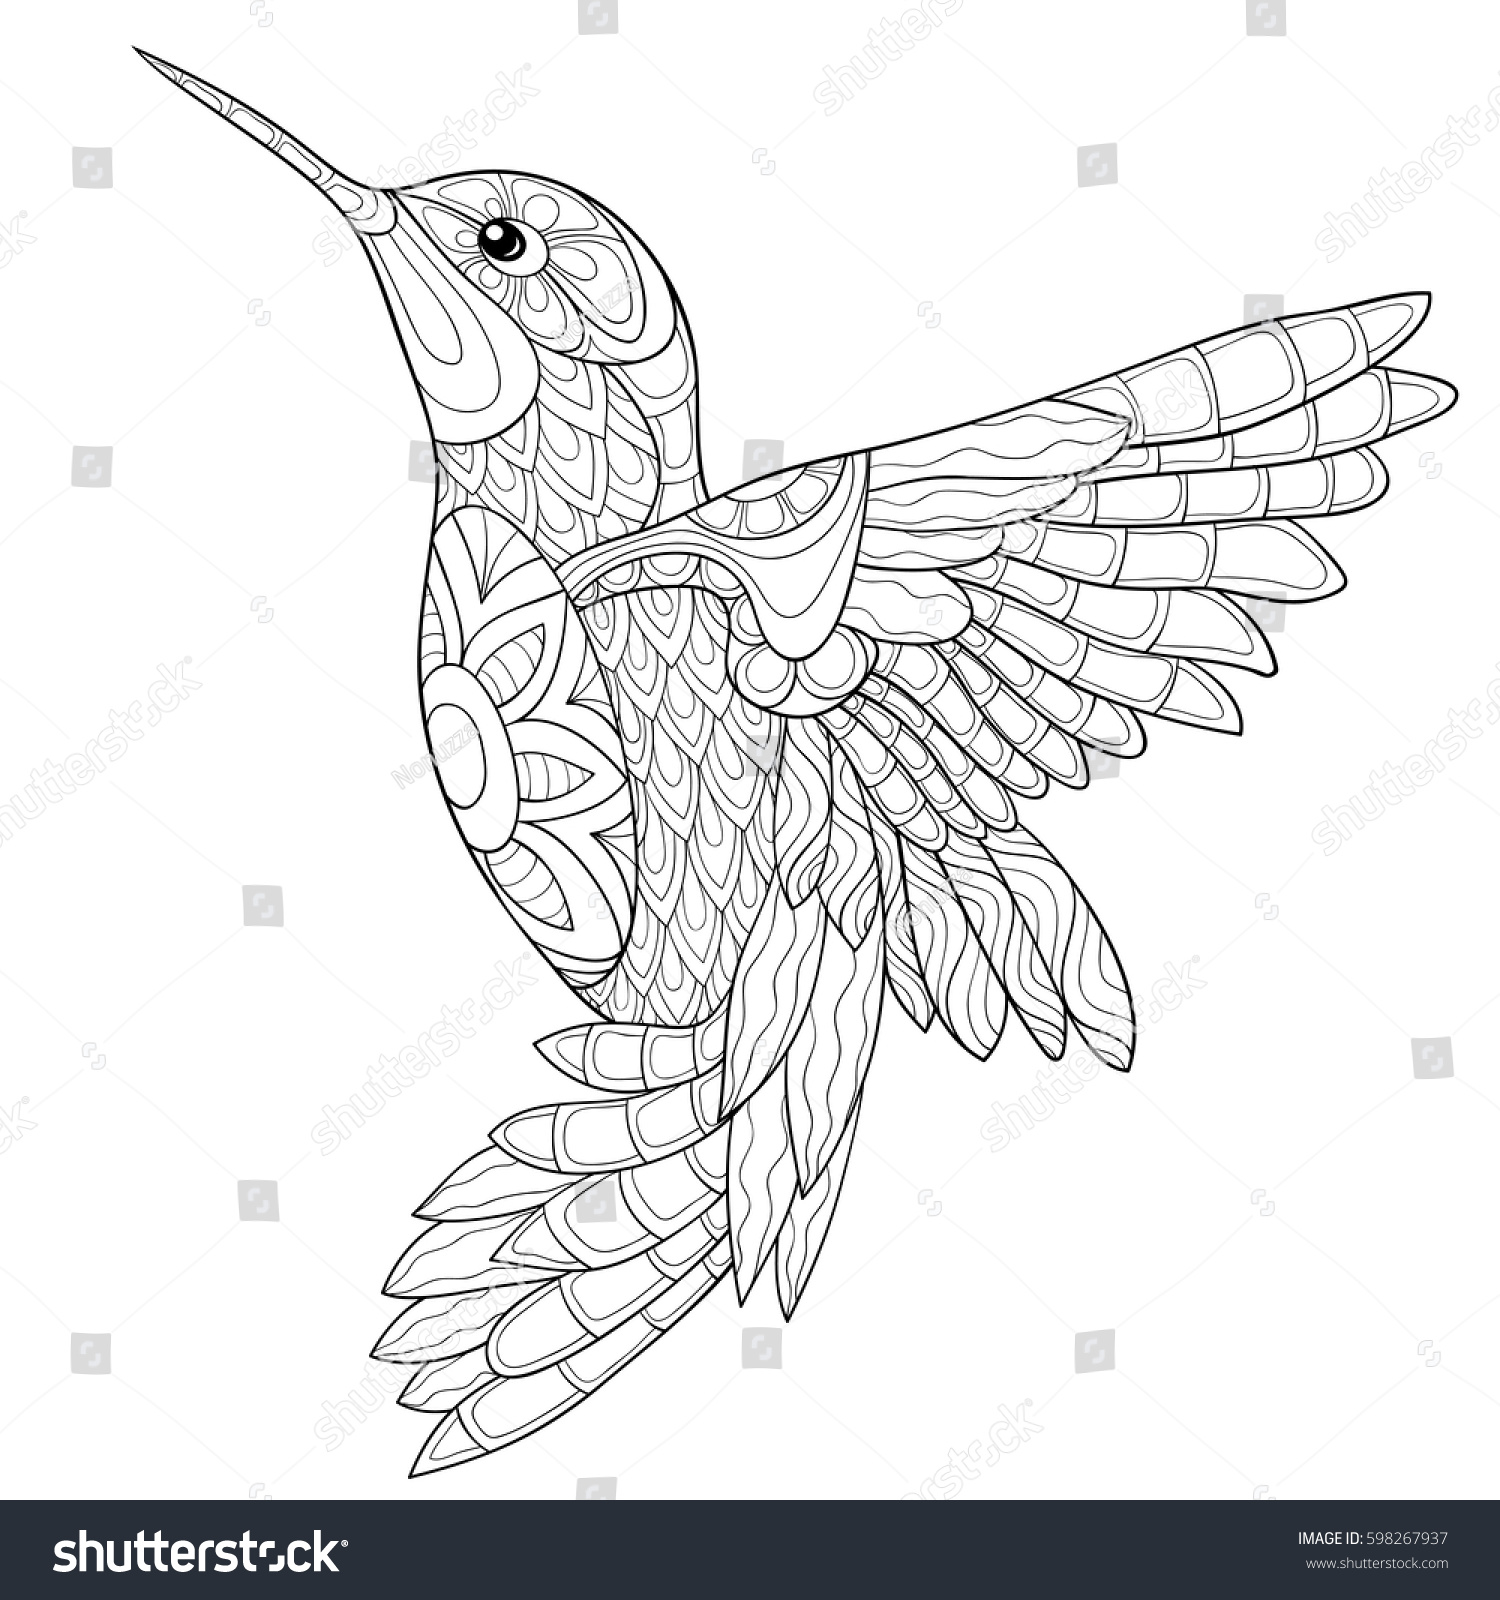 Adult Coloring Book Humming Birdzen Art Style Vector Illustration